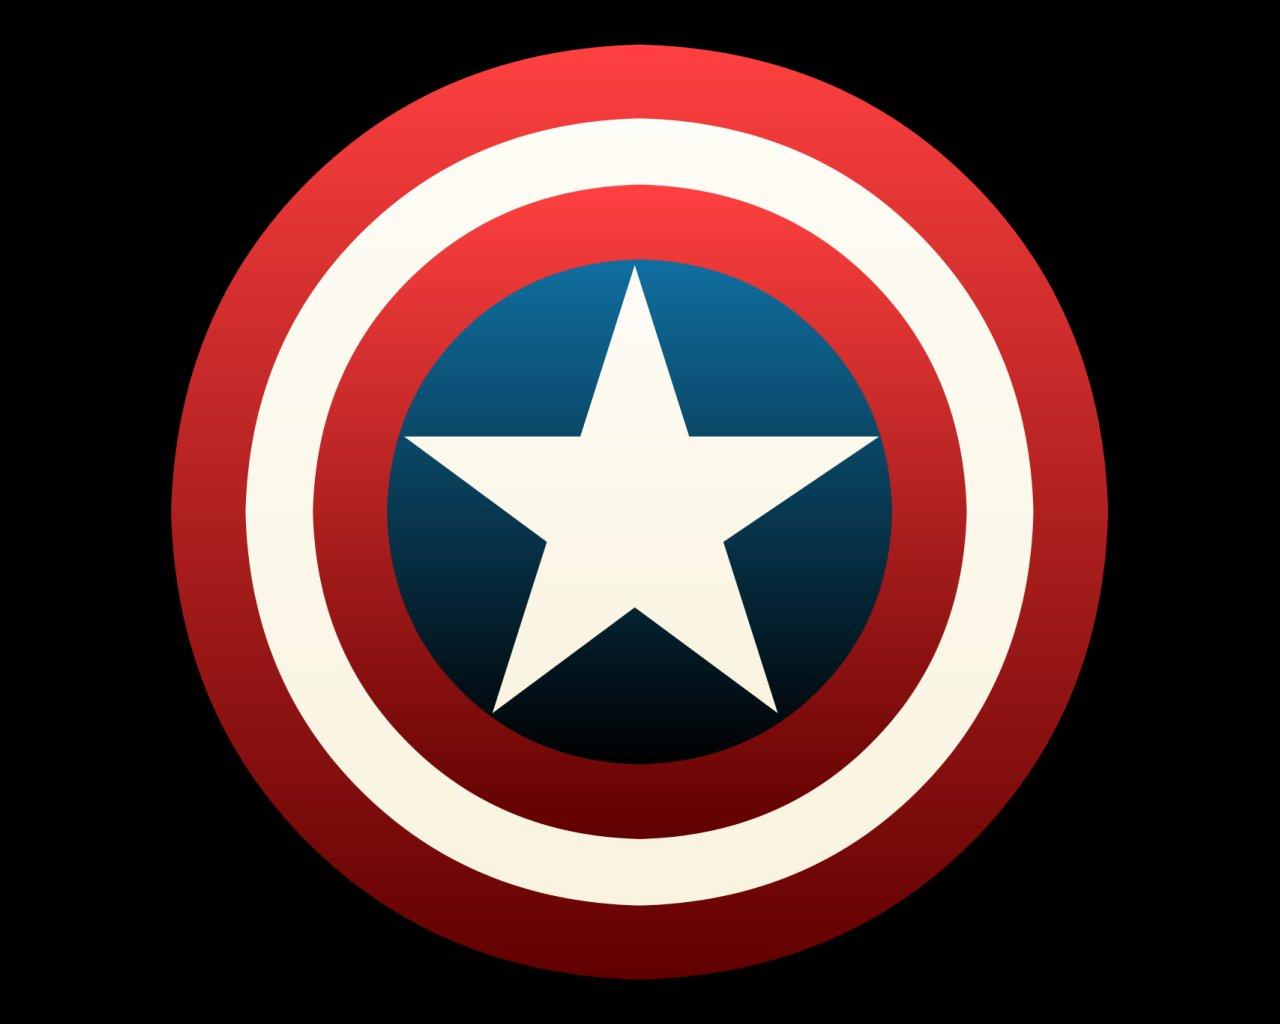 Captainamericashieldwallpaperhd 1280x1024